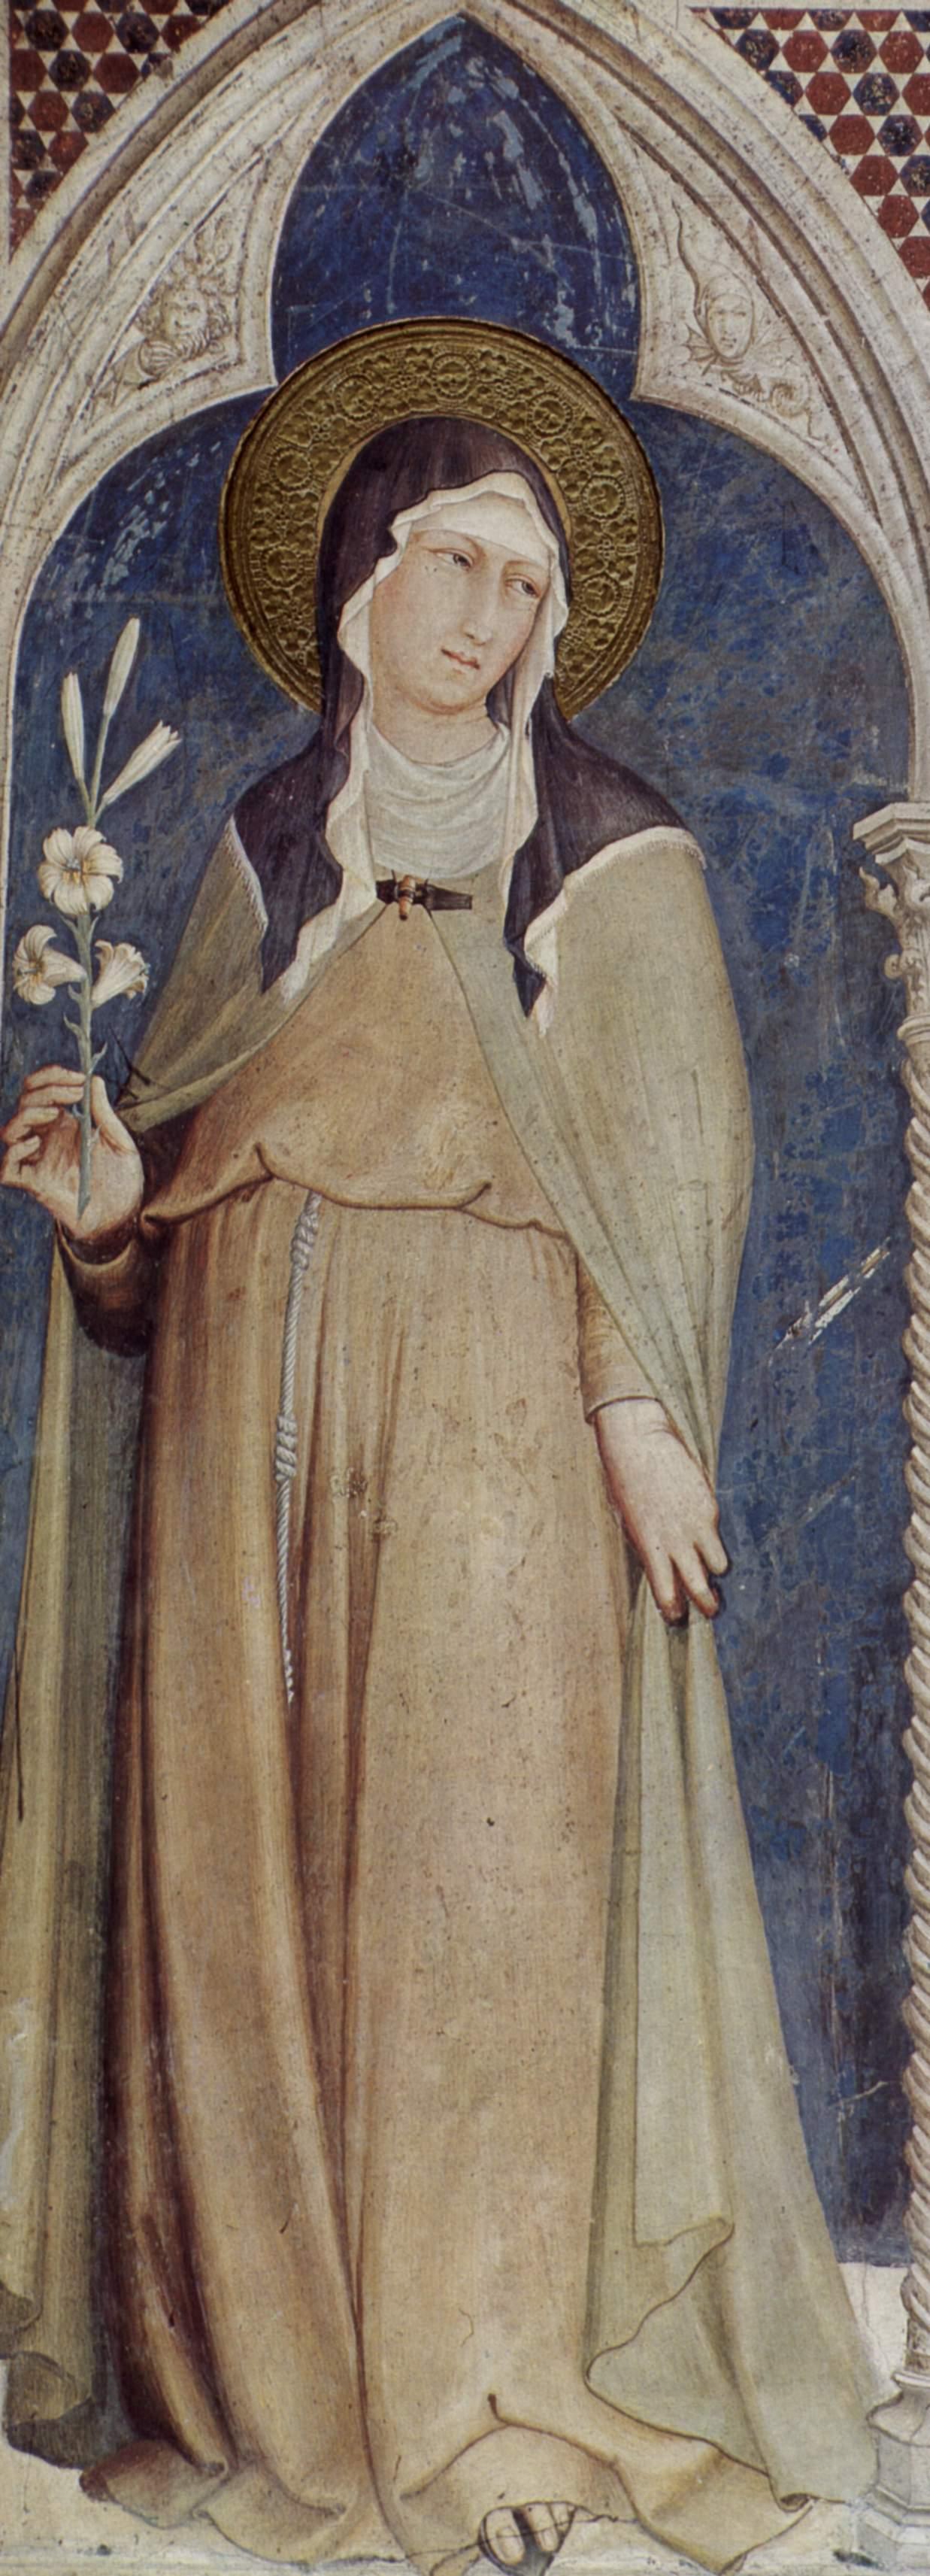 File:Santa Chiara d'Assisi (Simone Martini).JPG - Wikipedia